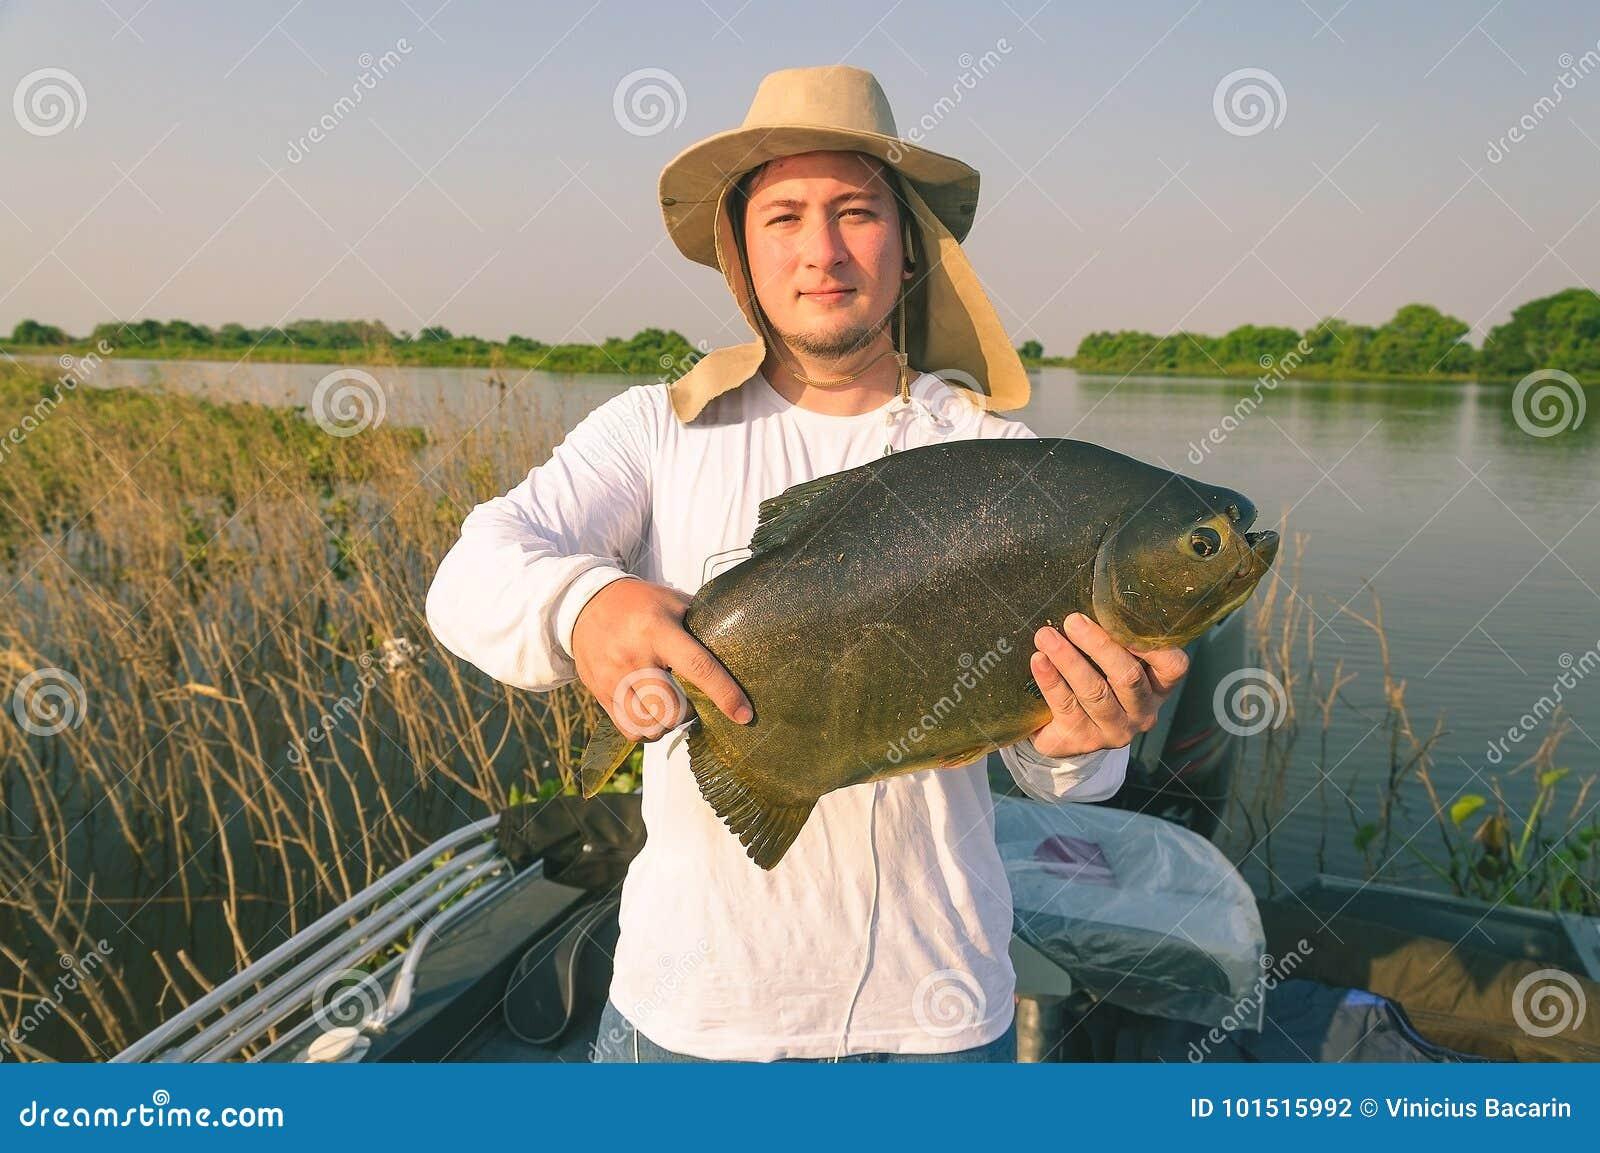 cda5249be30 Ψαράς που κρατά ένα ψάρι γνωστό ως Pacu Άτομο που χρησιμοποιεί το καπέλο  και το άσπρο πουκάμισο που κρατούν ένα ψάρι σε μια βάρκα Φωτογραφία που  λαμβάνεται ...